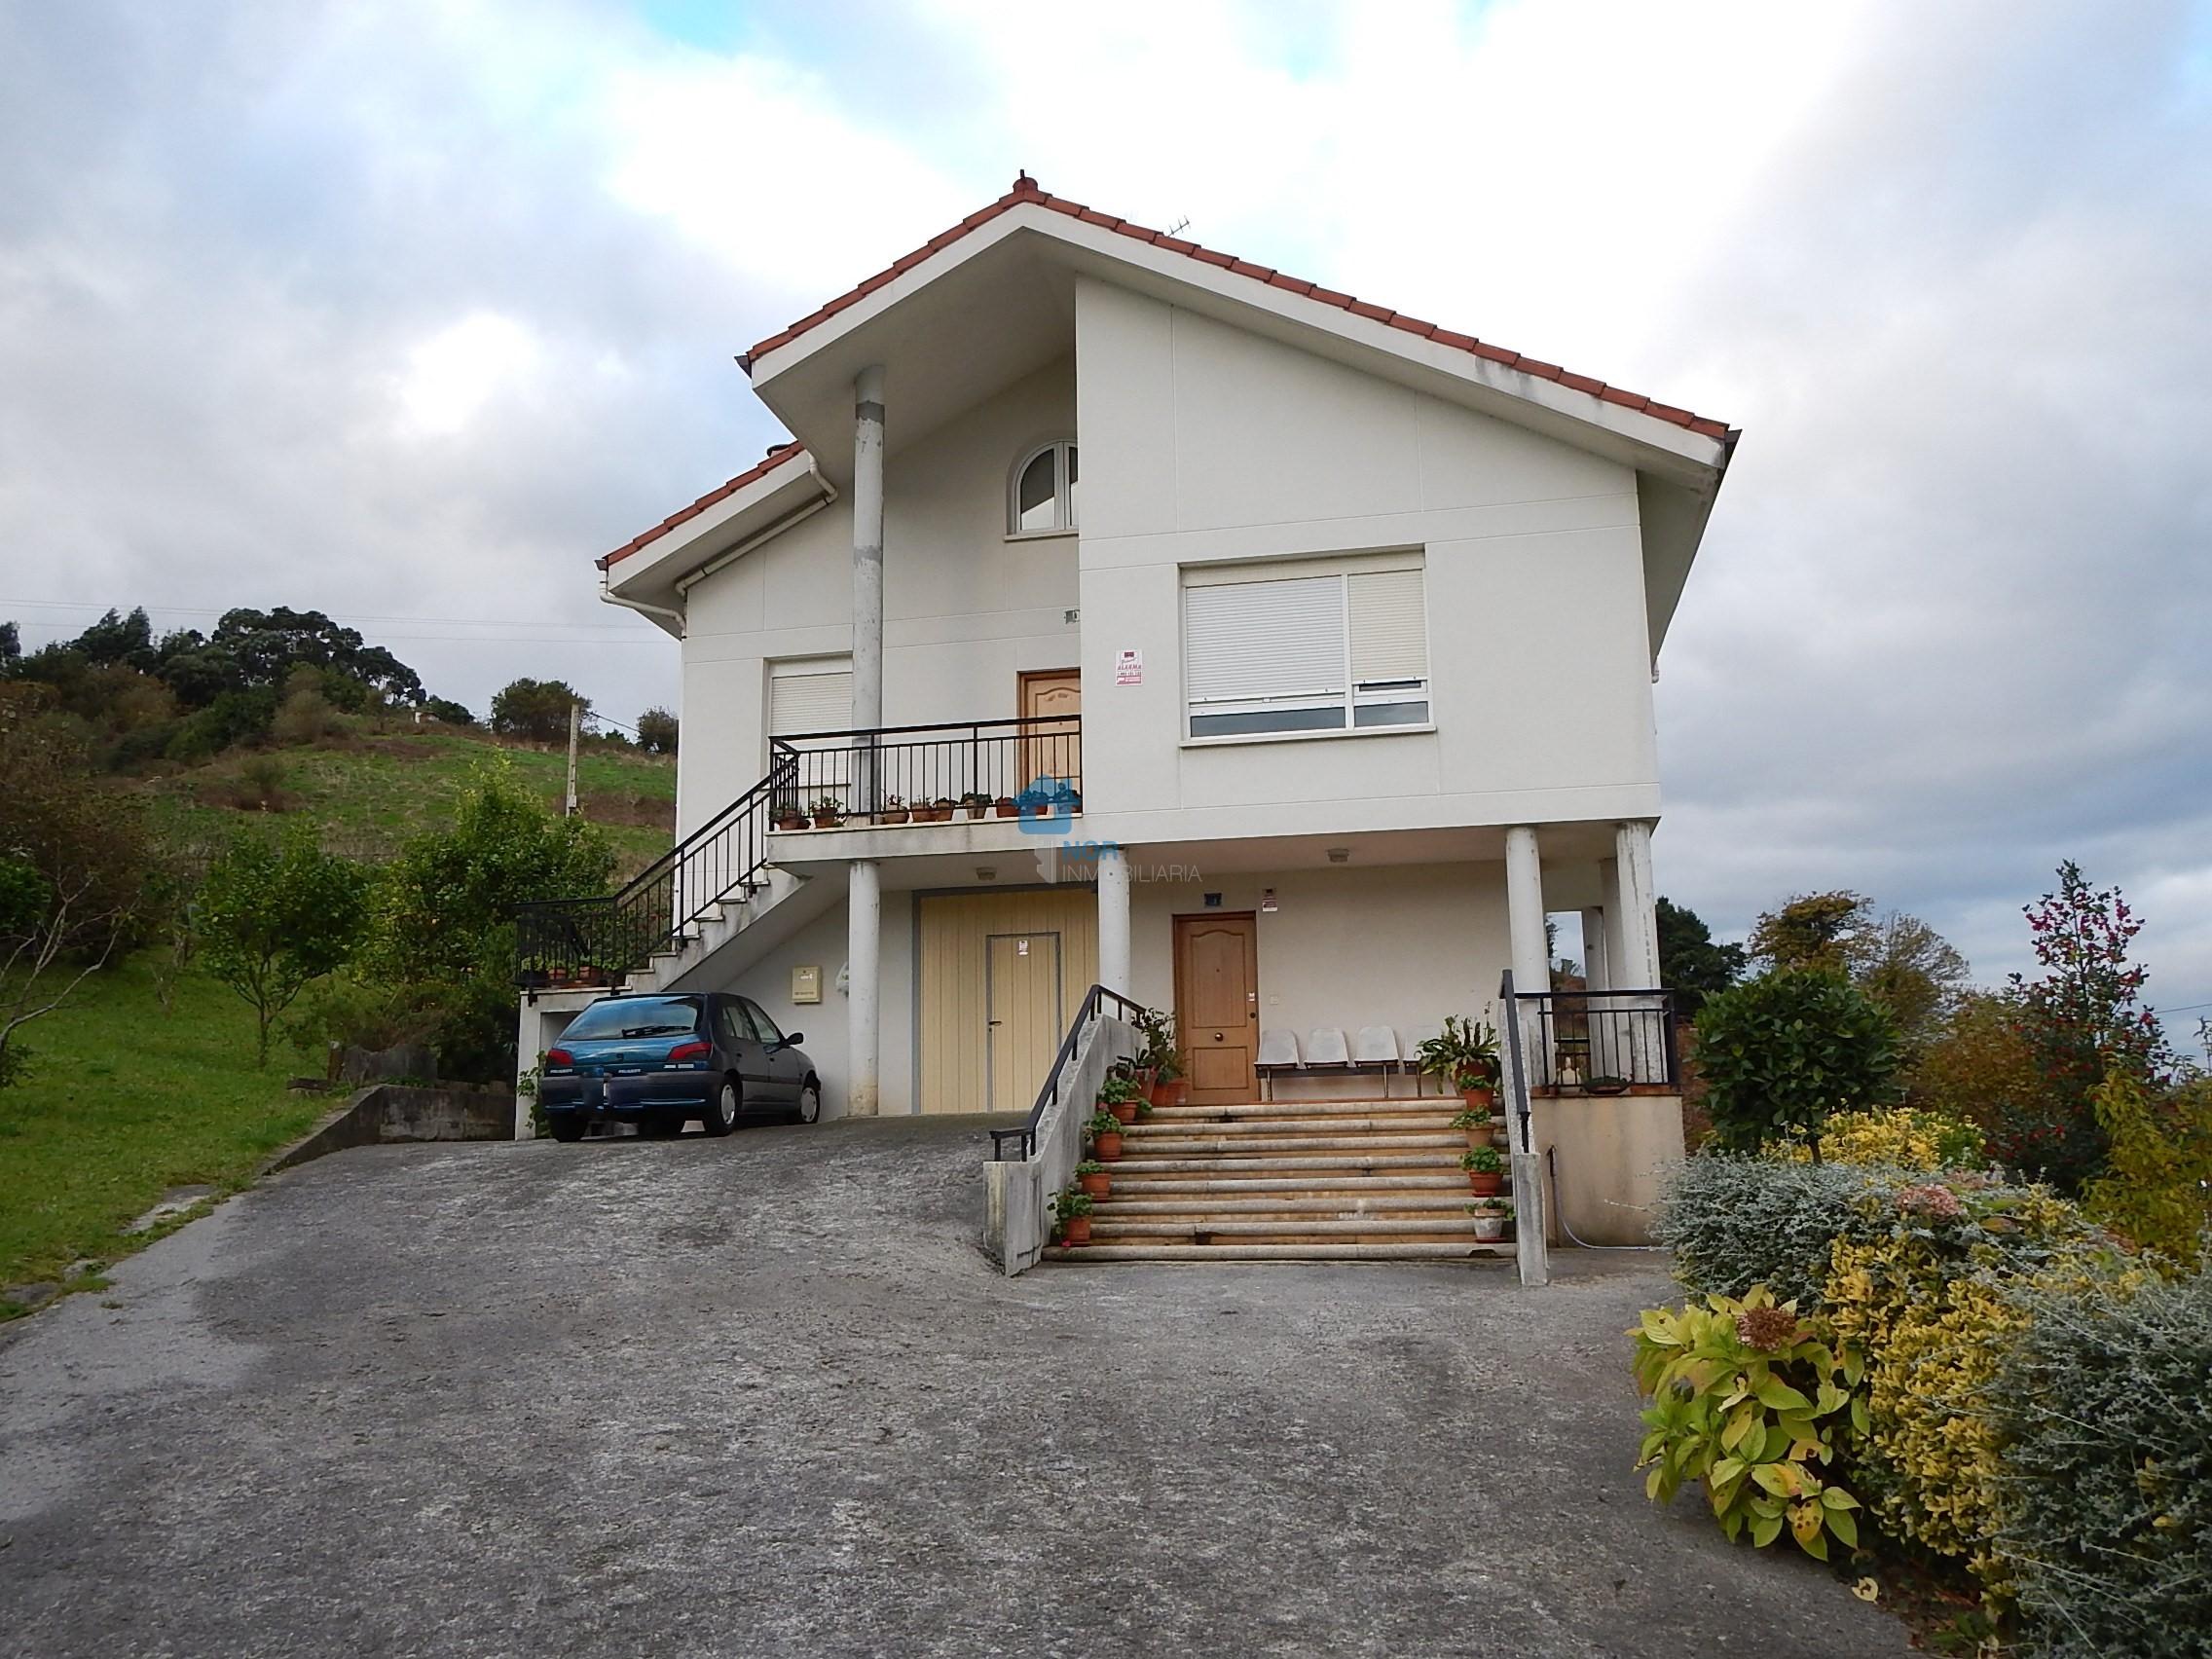 CASA INDIVIDUAL EN ALTO TARRUEZA- LAREDO, CANTABRIA